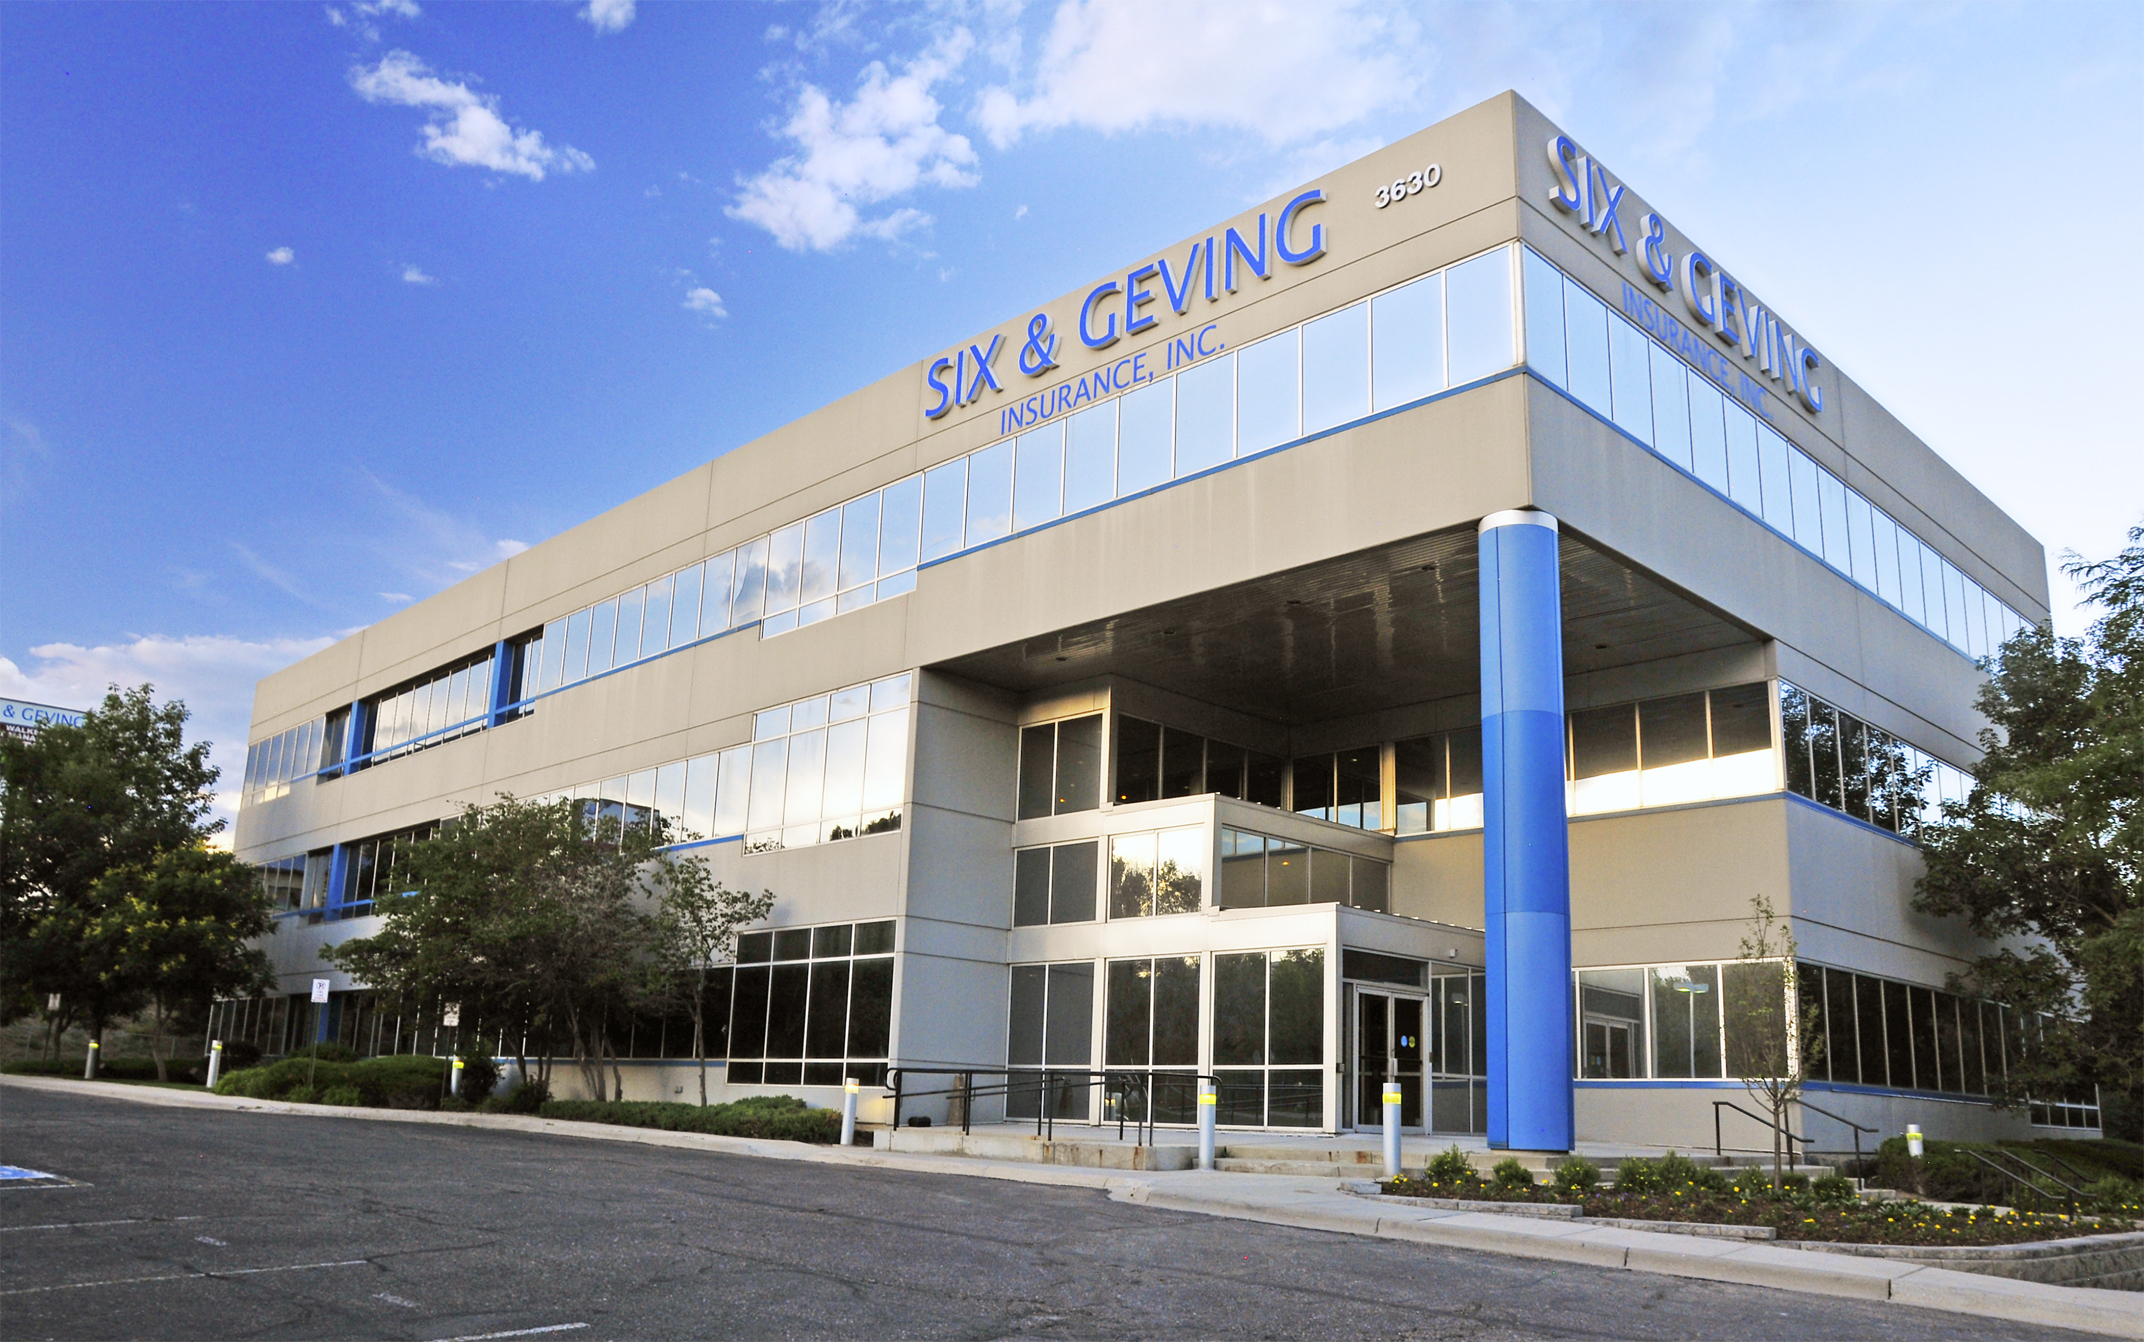 Six&Geving Buiding 150dpi